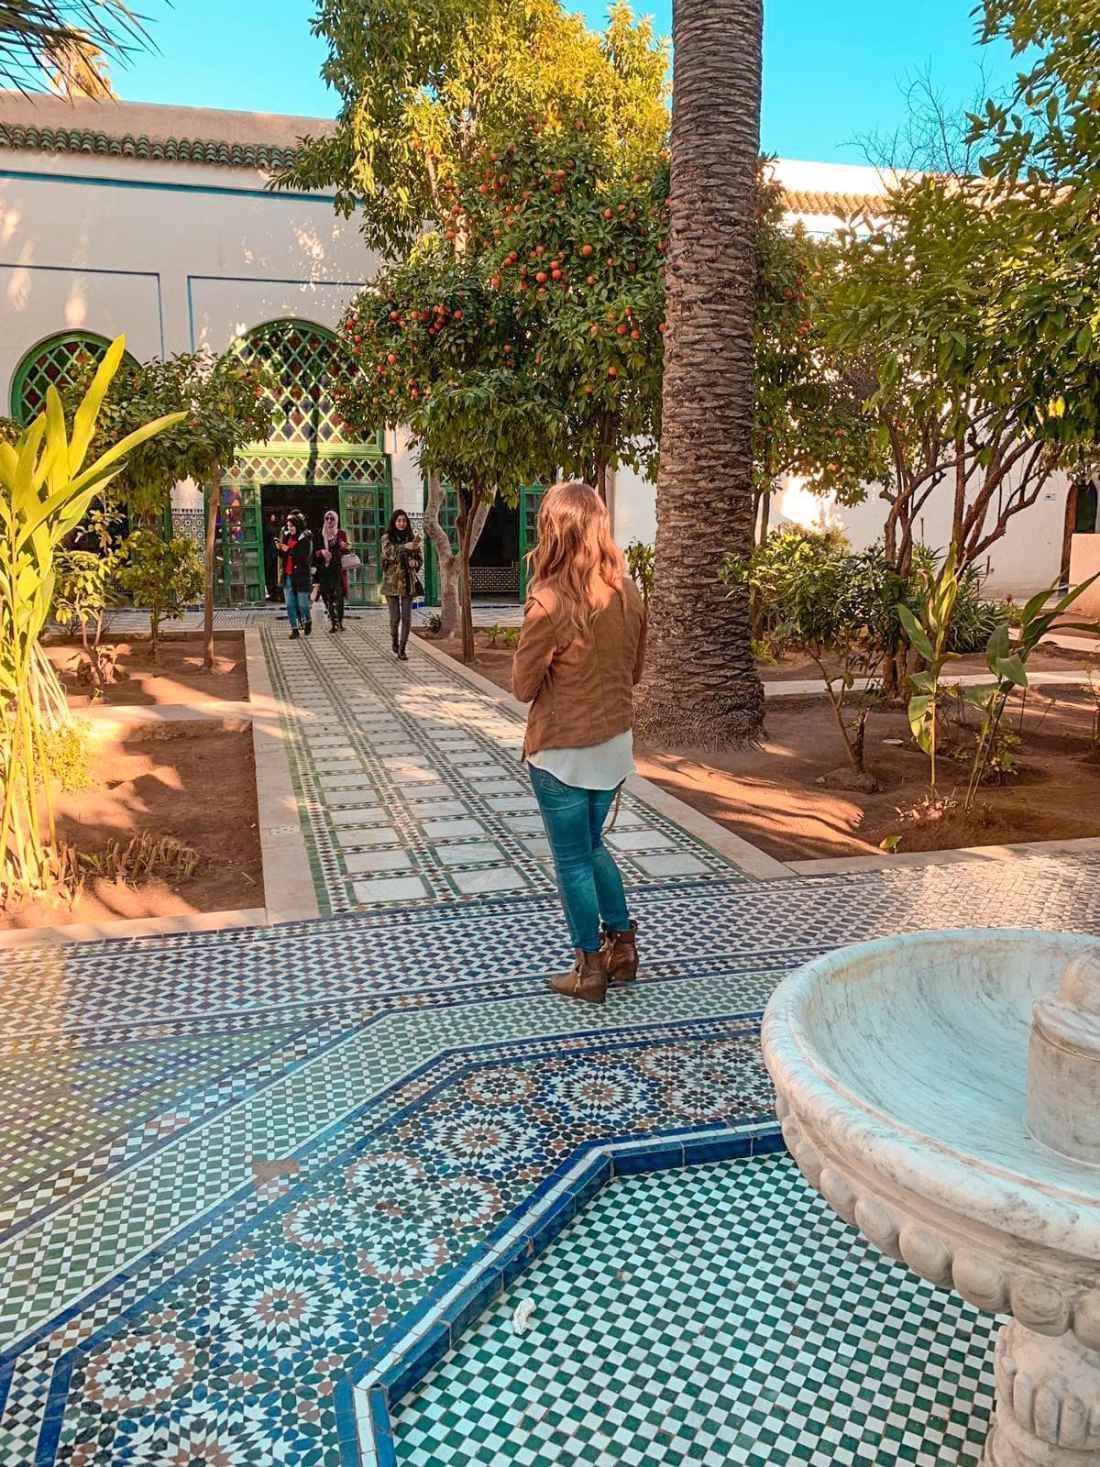 palace-bahia-marrakech-10-min